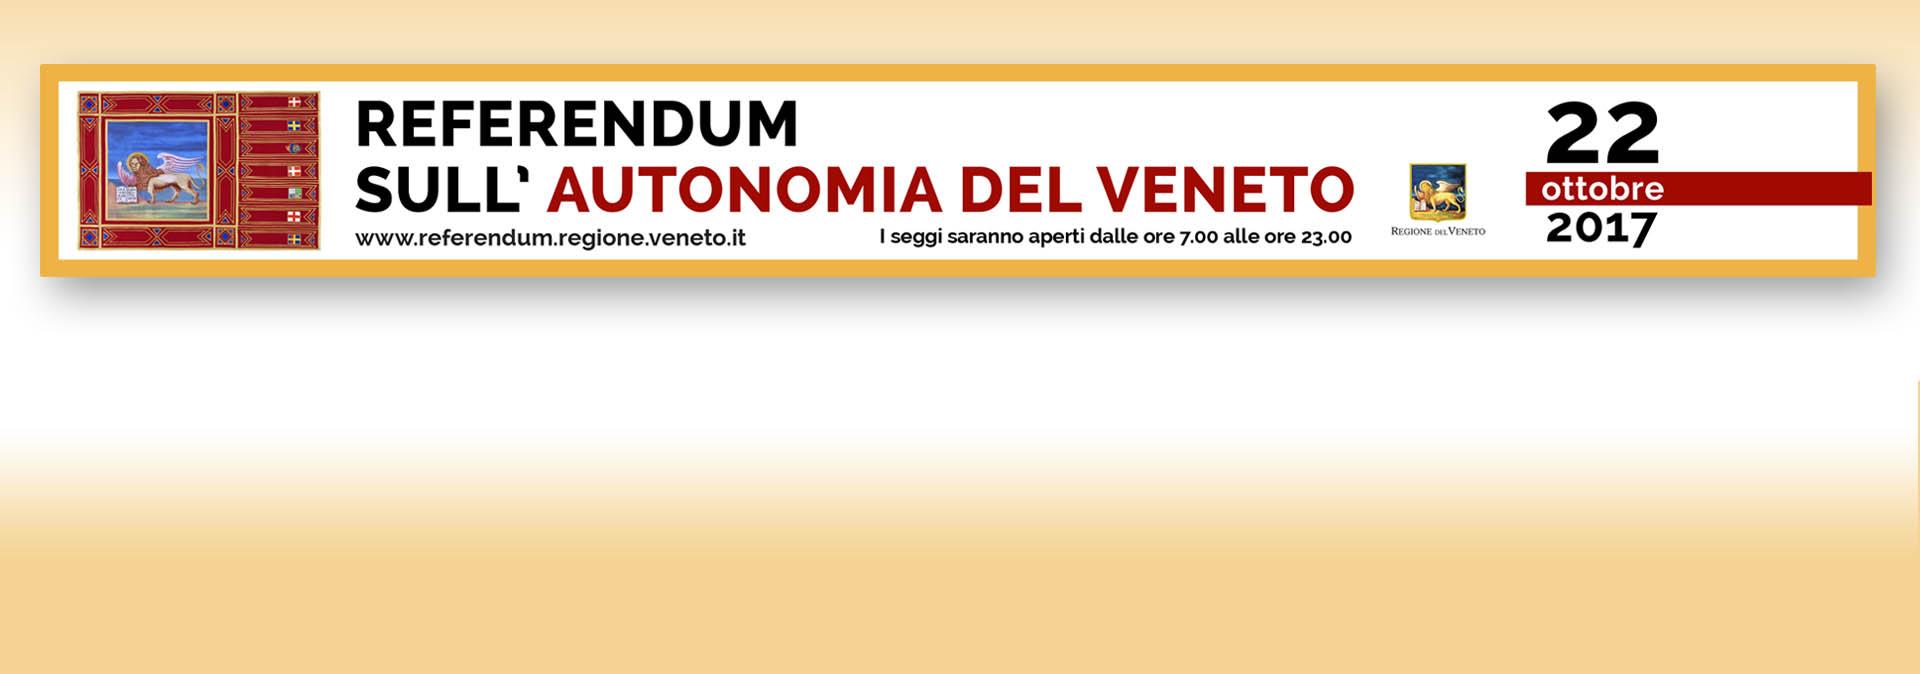 ReferendumVeneto_L.jpg